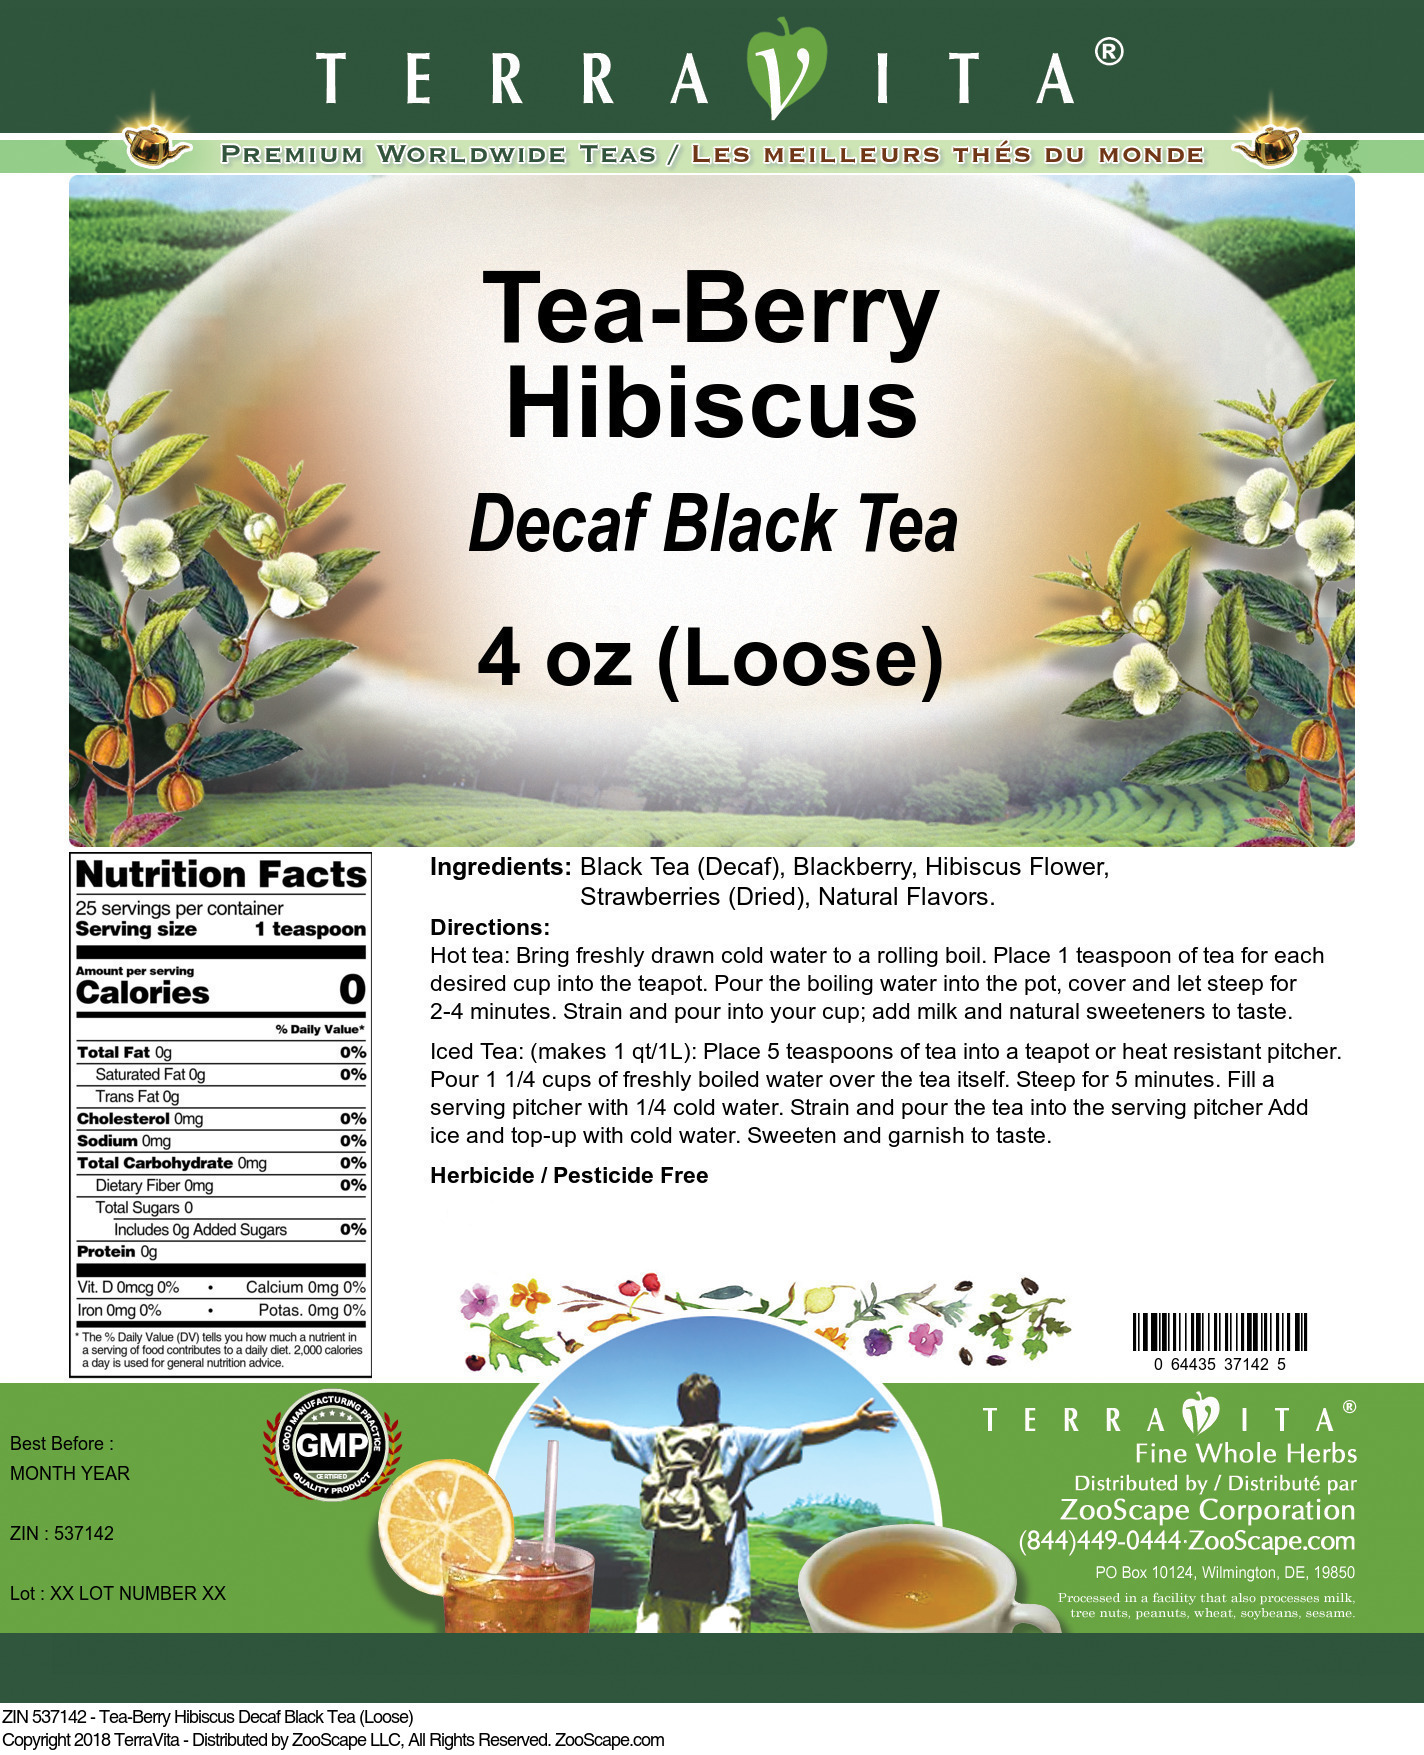 Tea-Berry Hibiscus Decaf Black Tea (Loose)